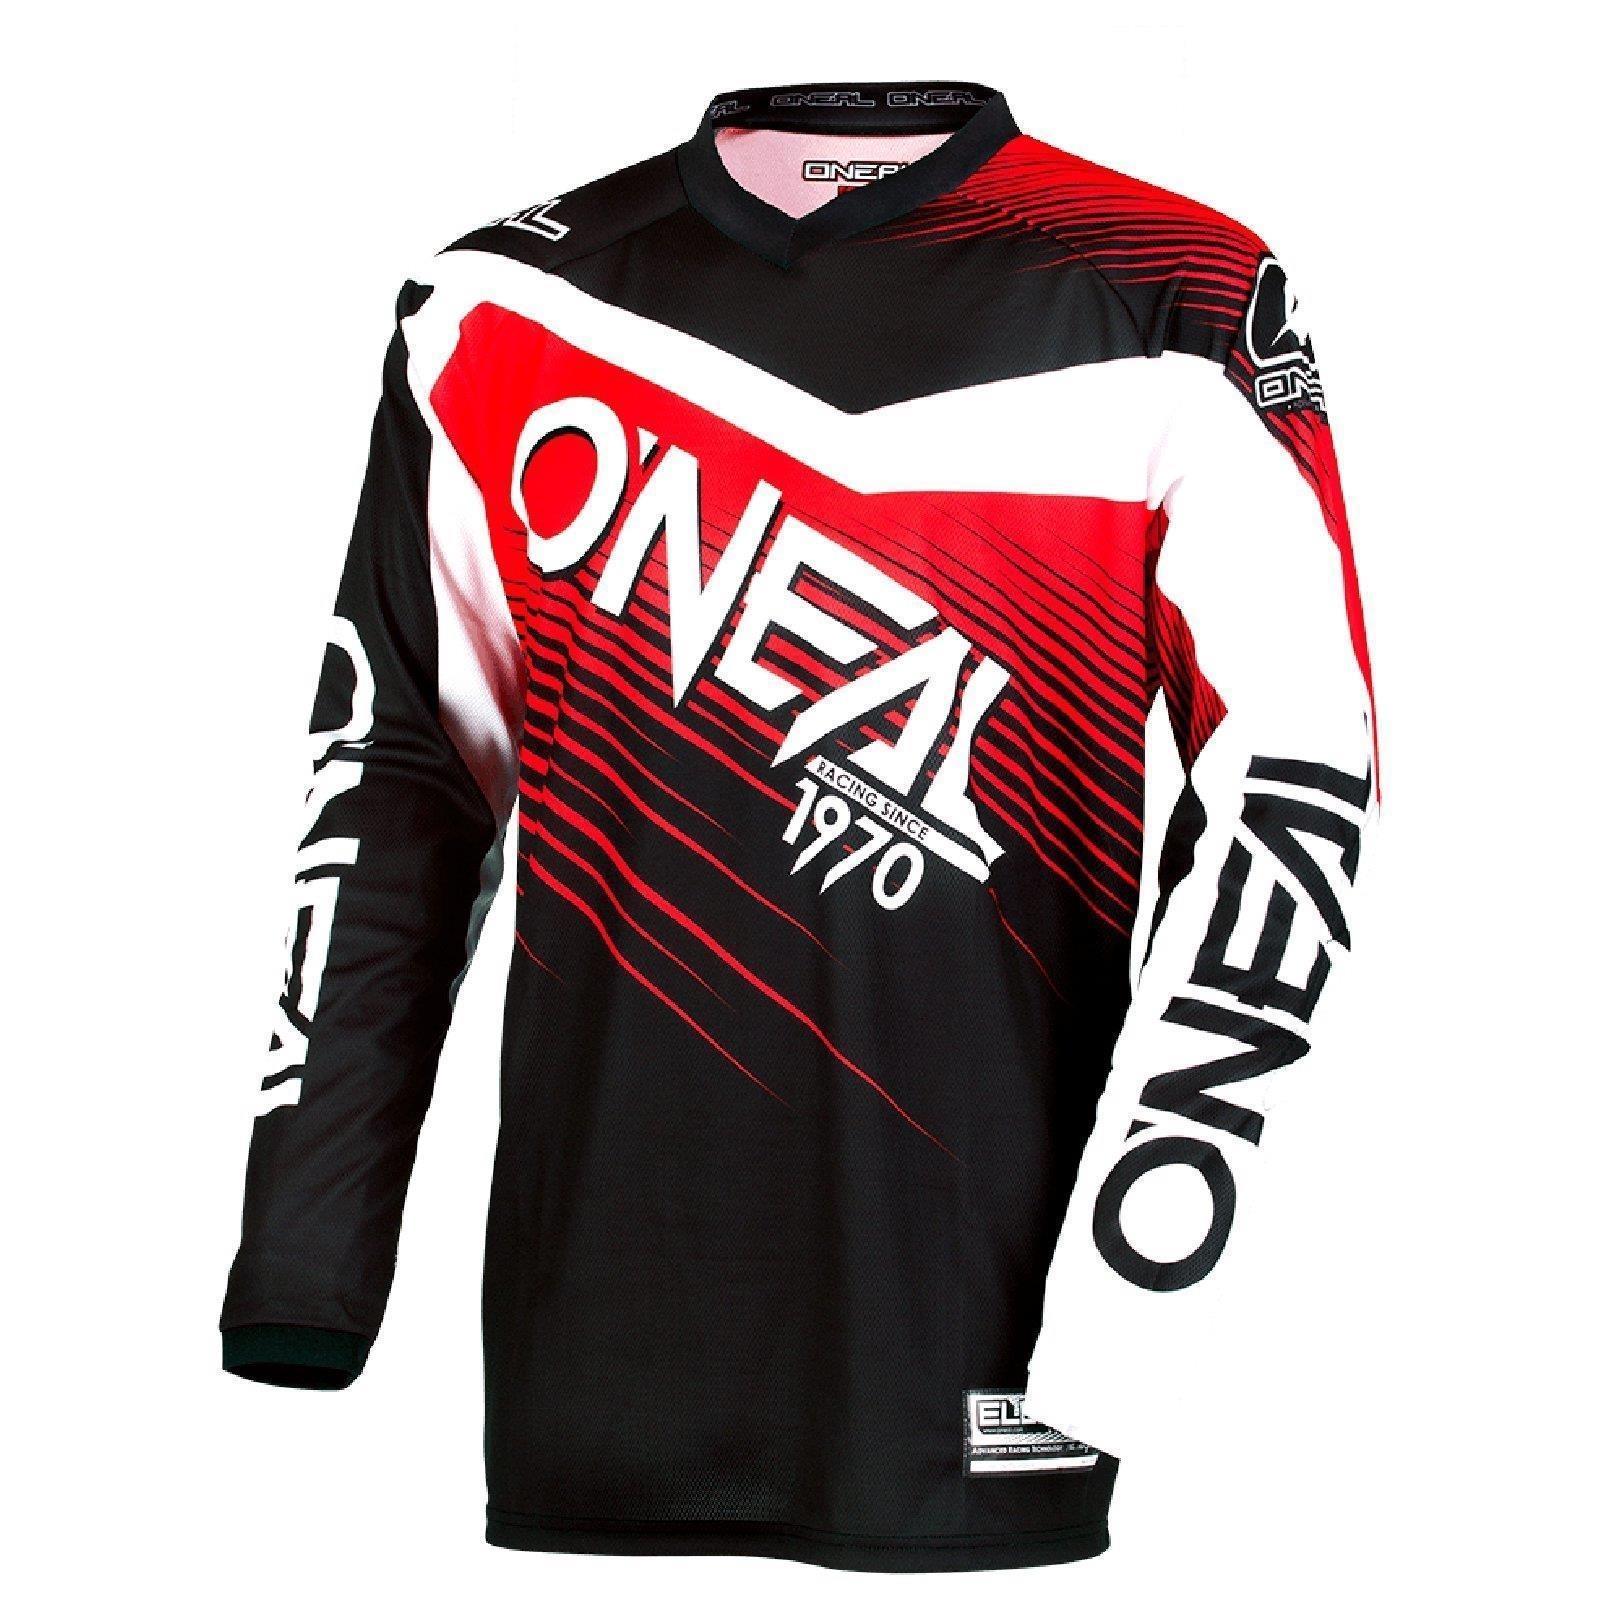 Elemento-oNeal-racewear-Jersey-pantalones-a-ninos-adulto-Motocross-Enduro-downhill miniatura 24